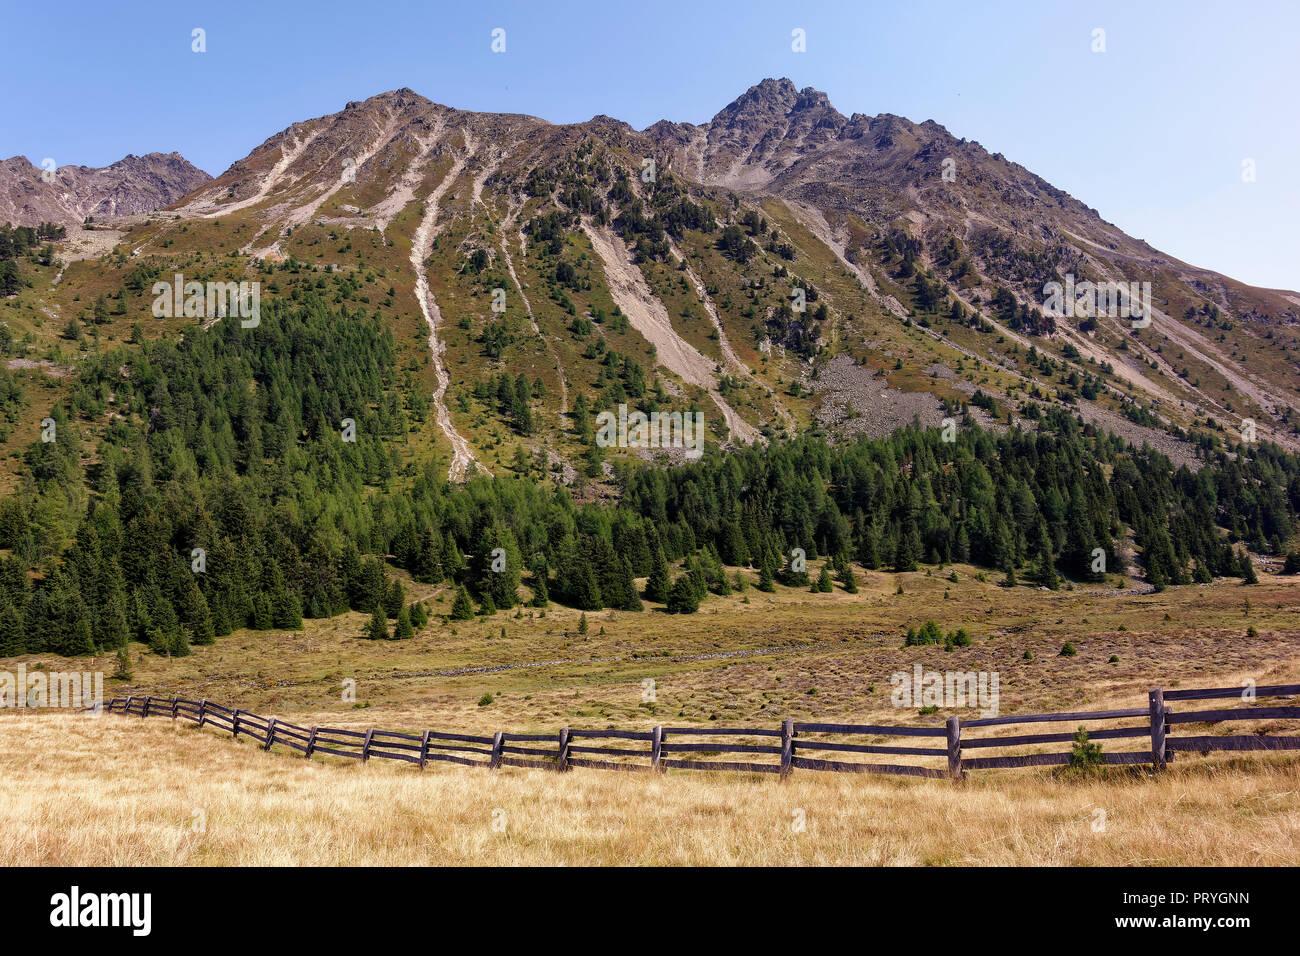 Biotope Plamorter moss, moor, Reschenpass, Vinschgau, South Tyrol, Italy - Stock Image